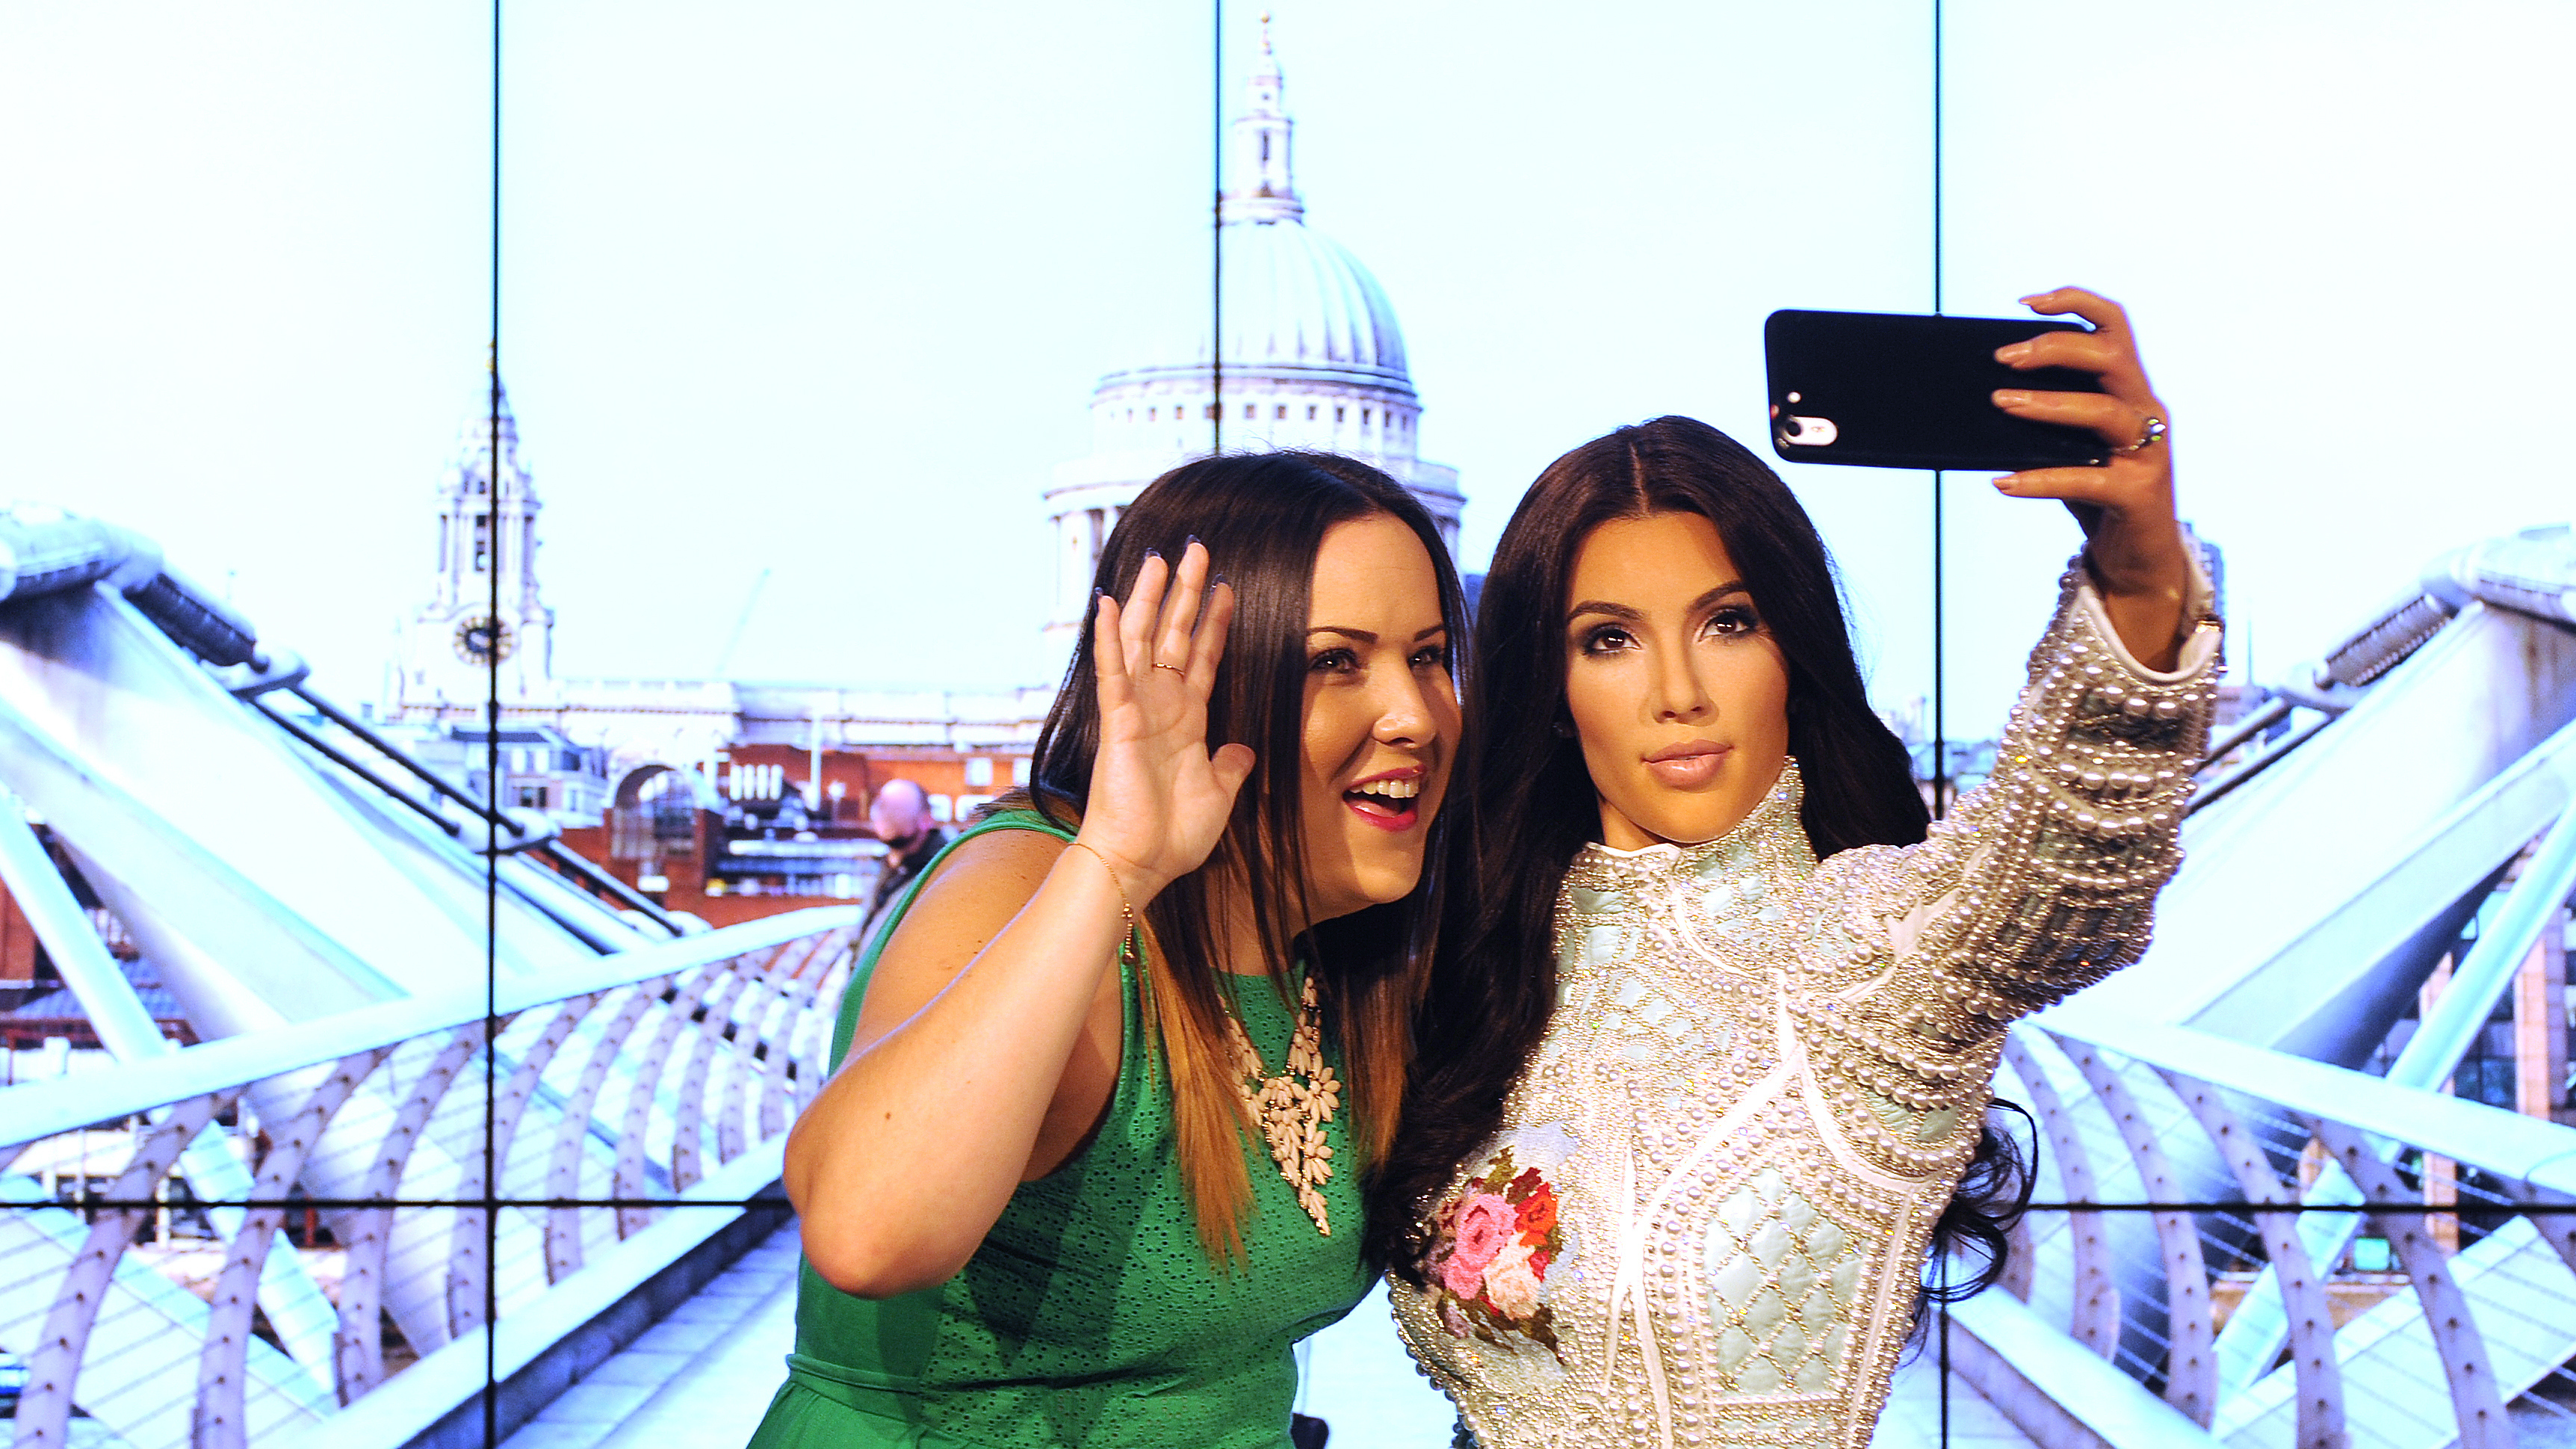 Selfie Selfie2015 nude photos 2019